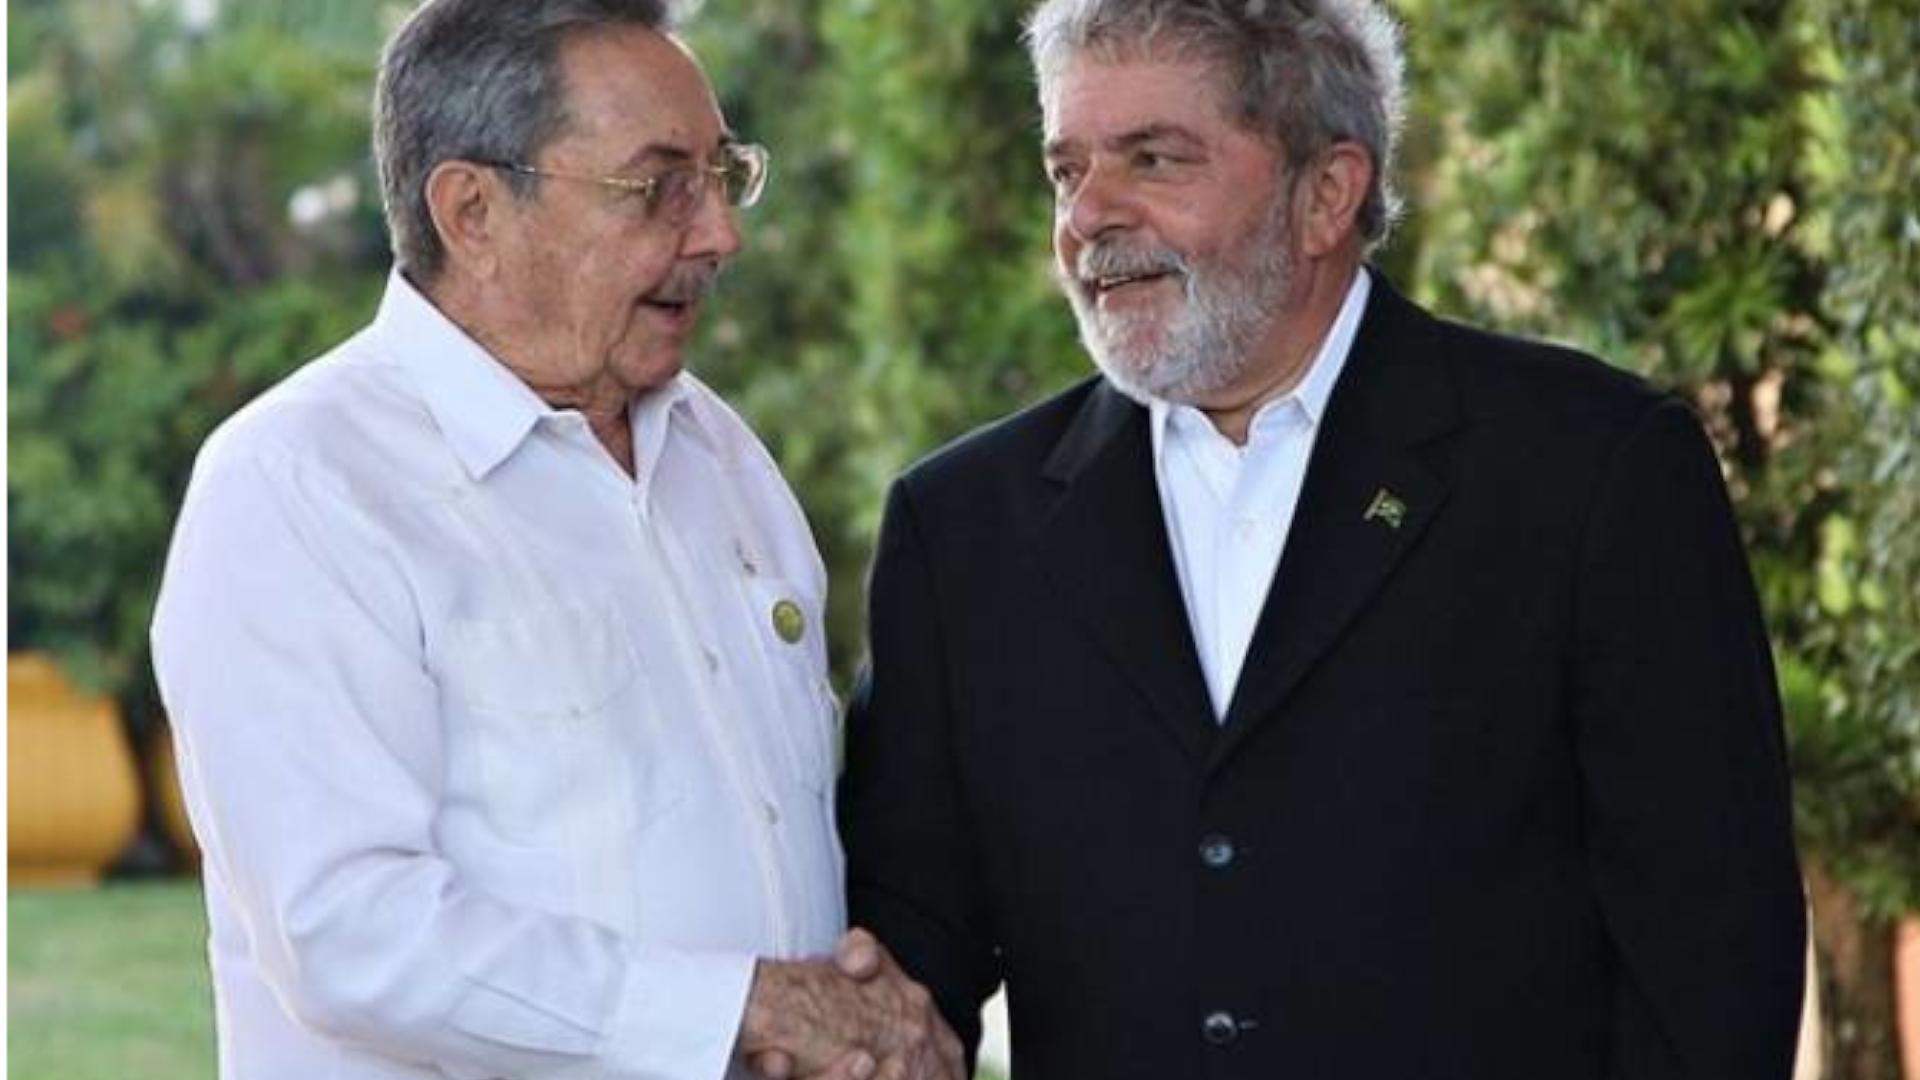 IMAGEM: Lula, o liberticida bem-intencionado